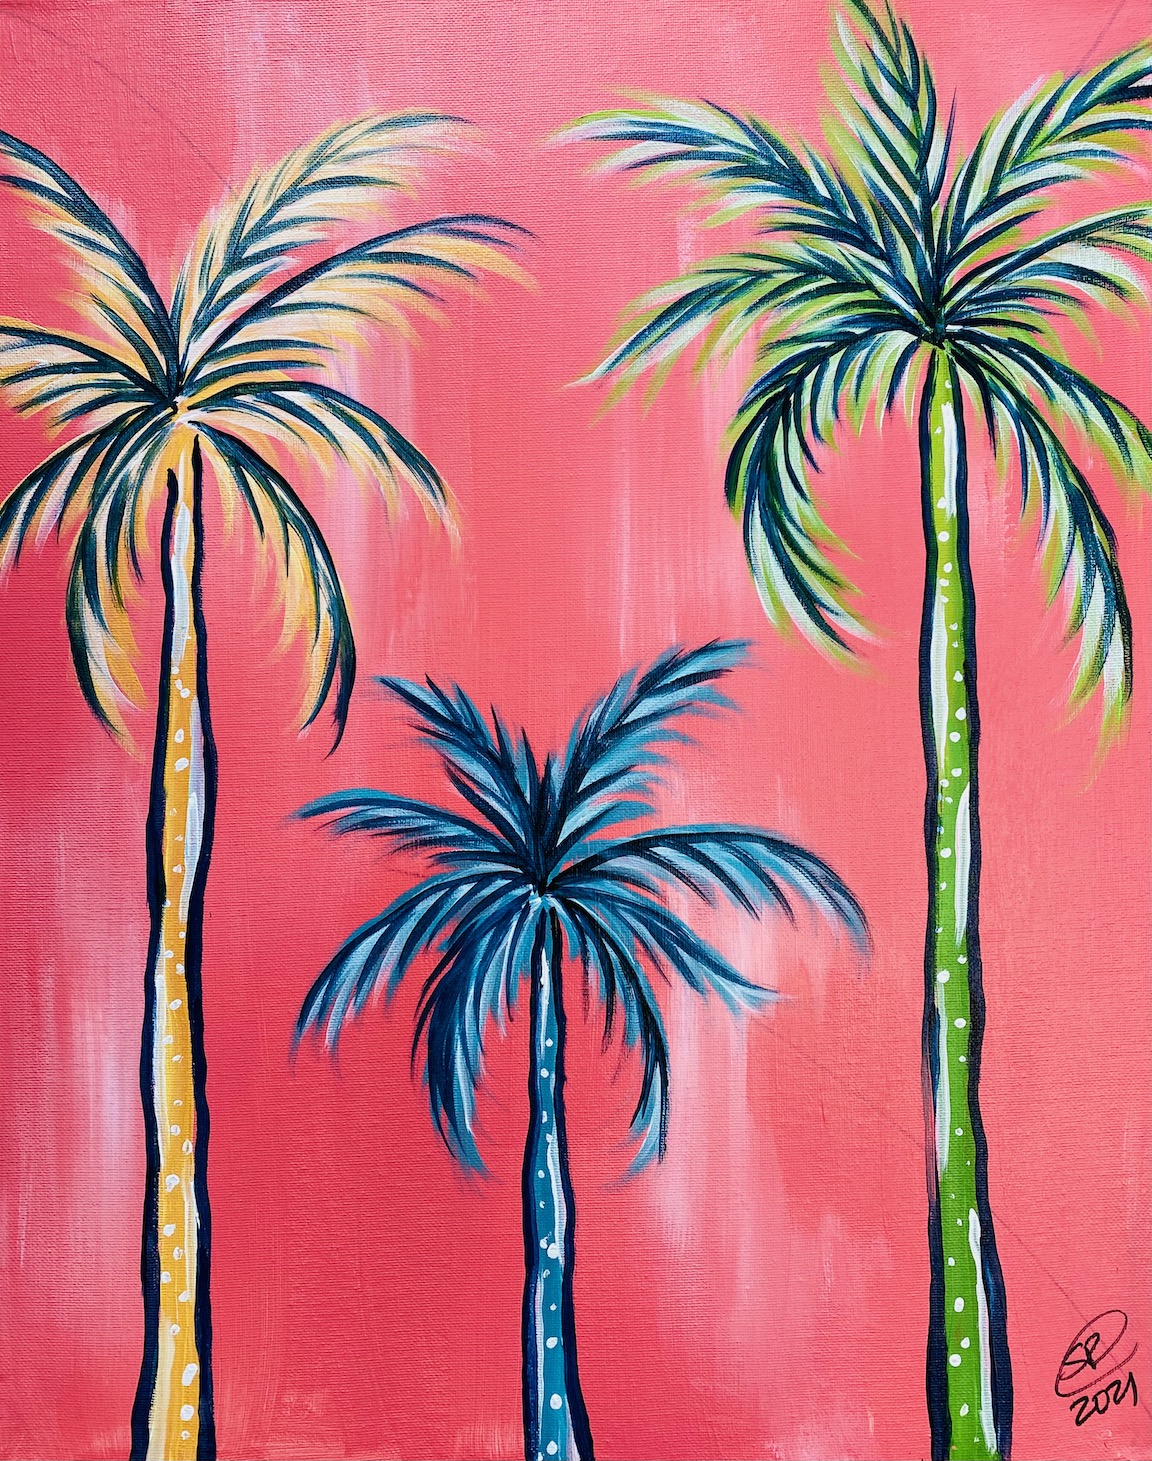 Polka Dot Palms